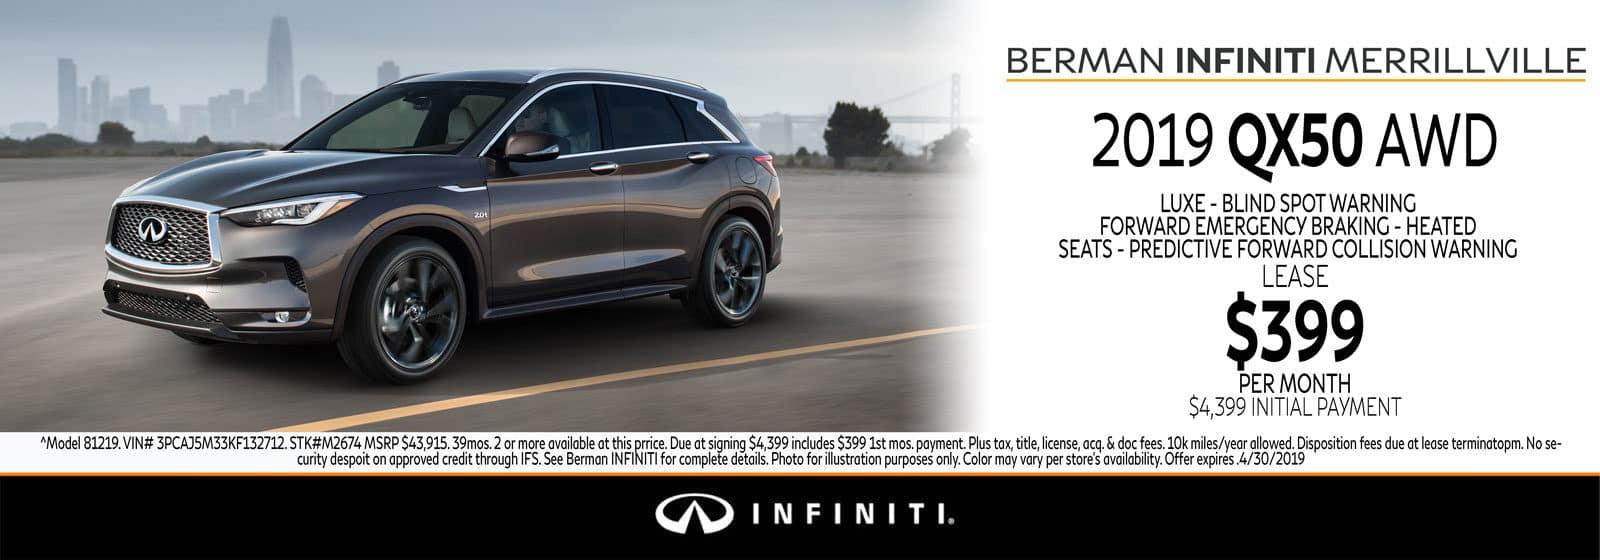 New 2019 INFINITI QX50 April Offer at Berman INFINITI of Merrillville!